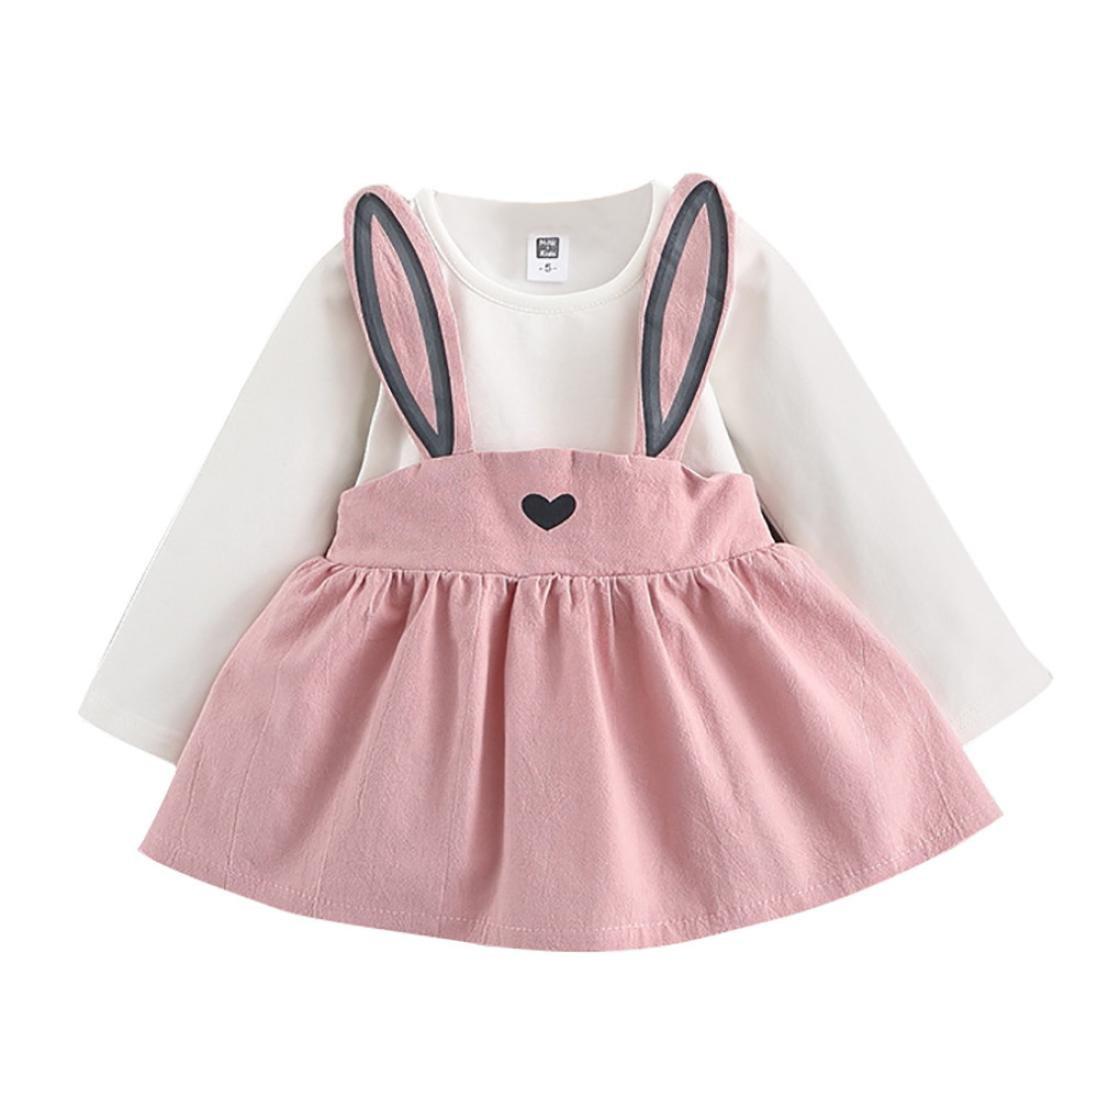 OVERDOSE Herbst Baby M/ädchen Baumwolle Langarm Cute Rabbit T-Shirt Kleid Bandage Bandage Anzug Princess Mini Dress